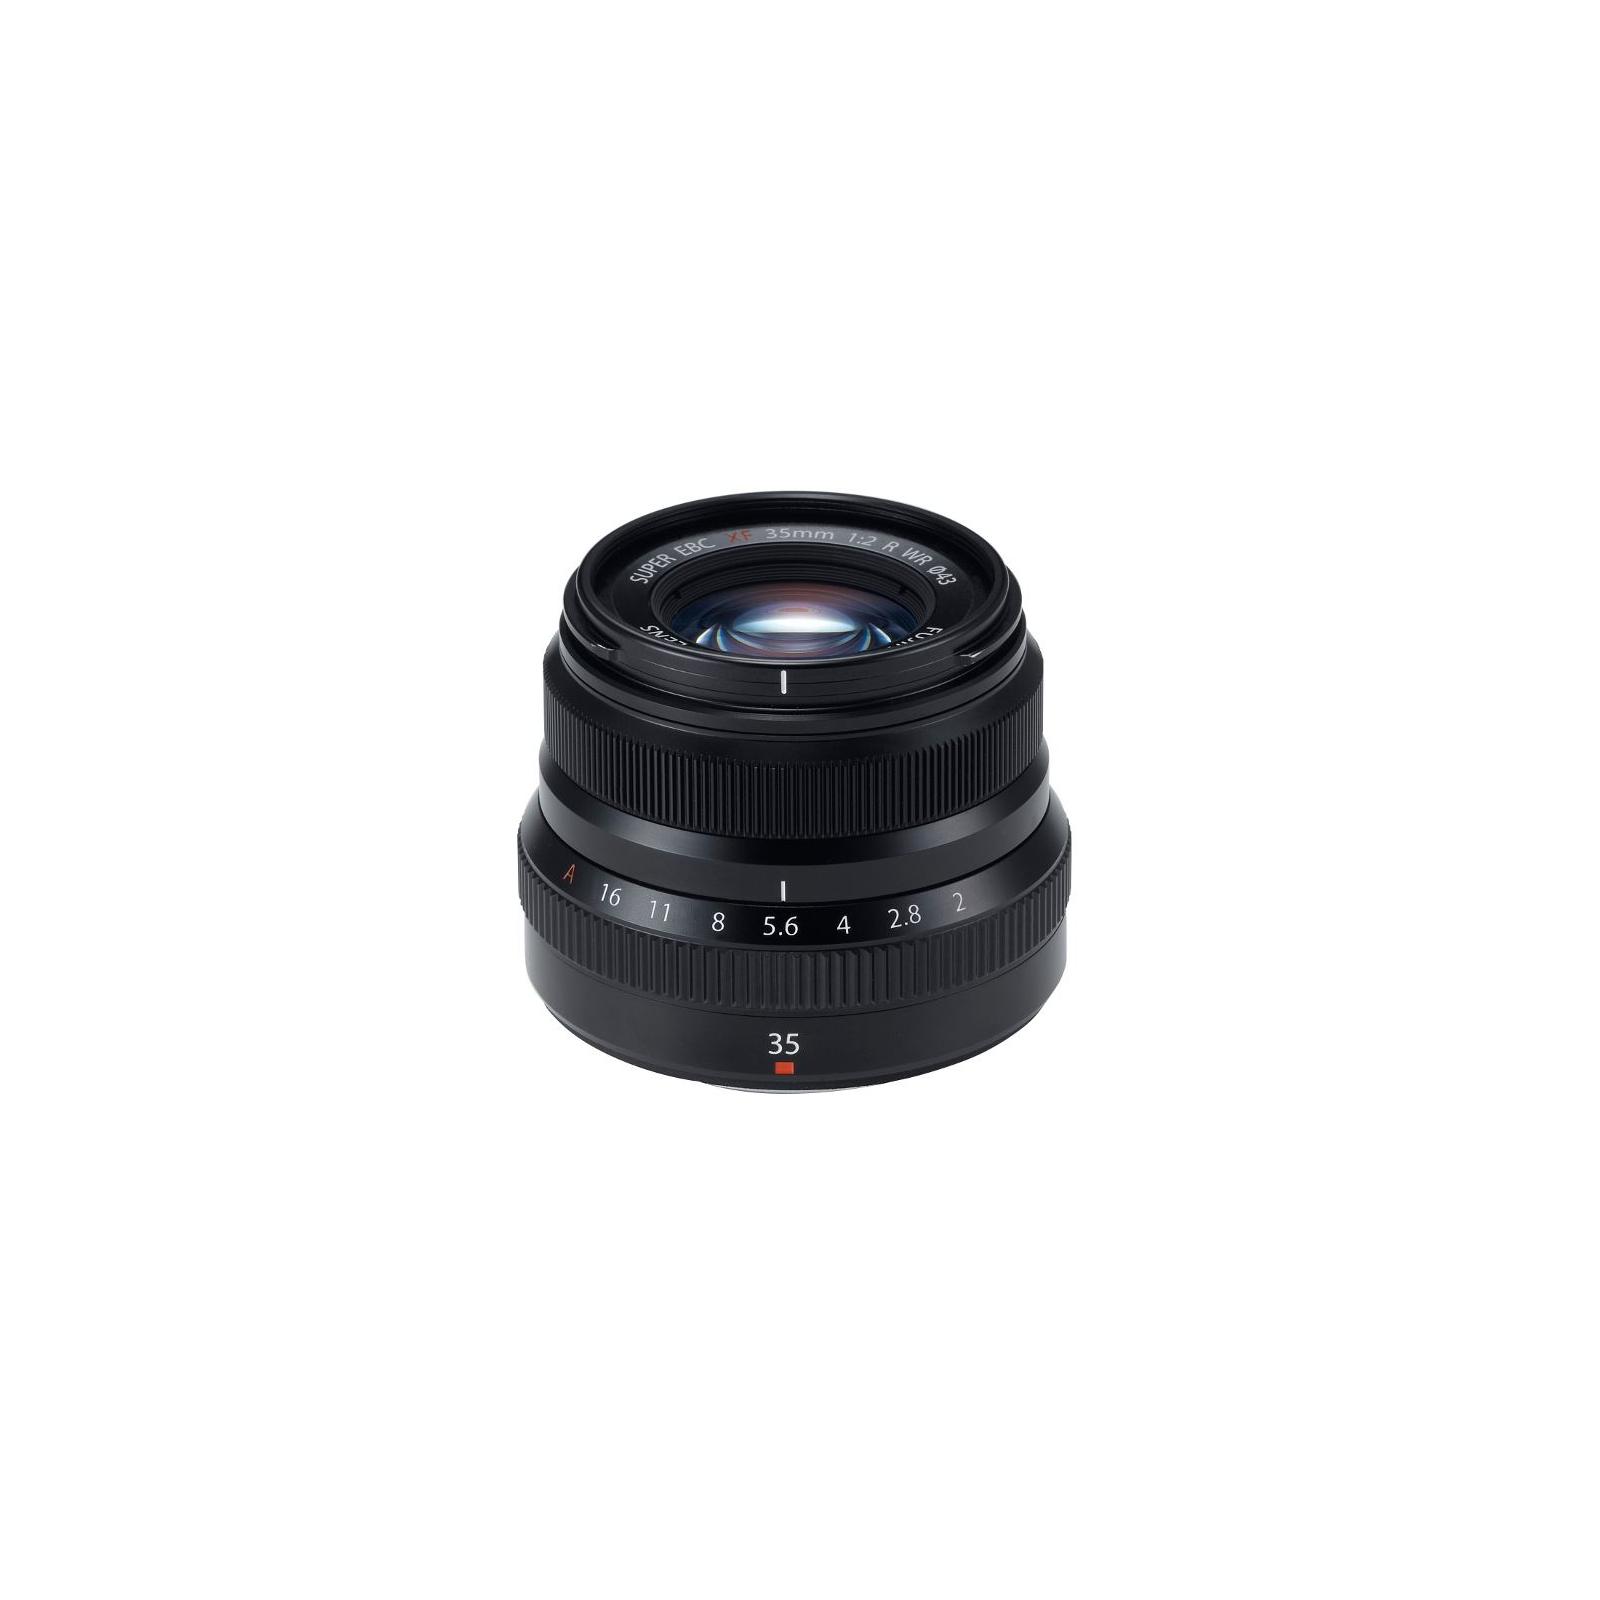 Объектив Fujifilm XF 35mm F2.0 Black (16481878)